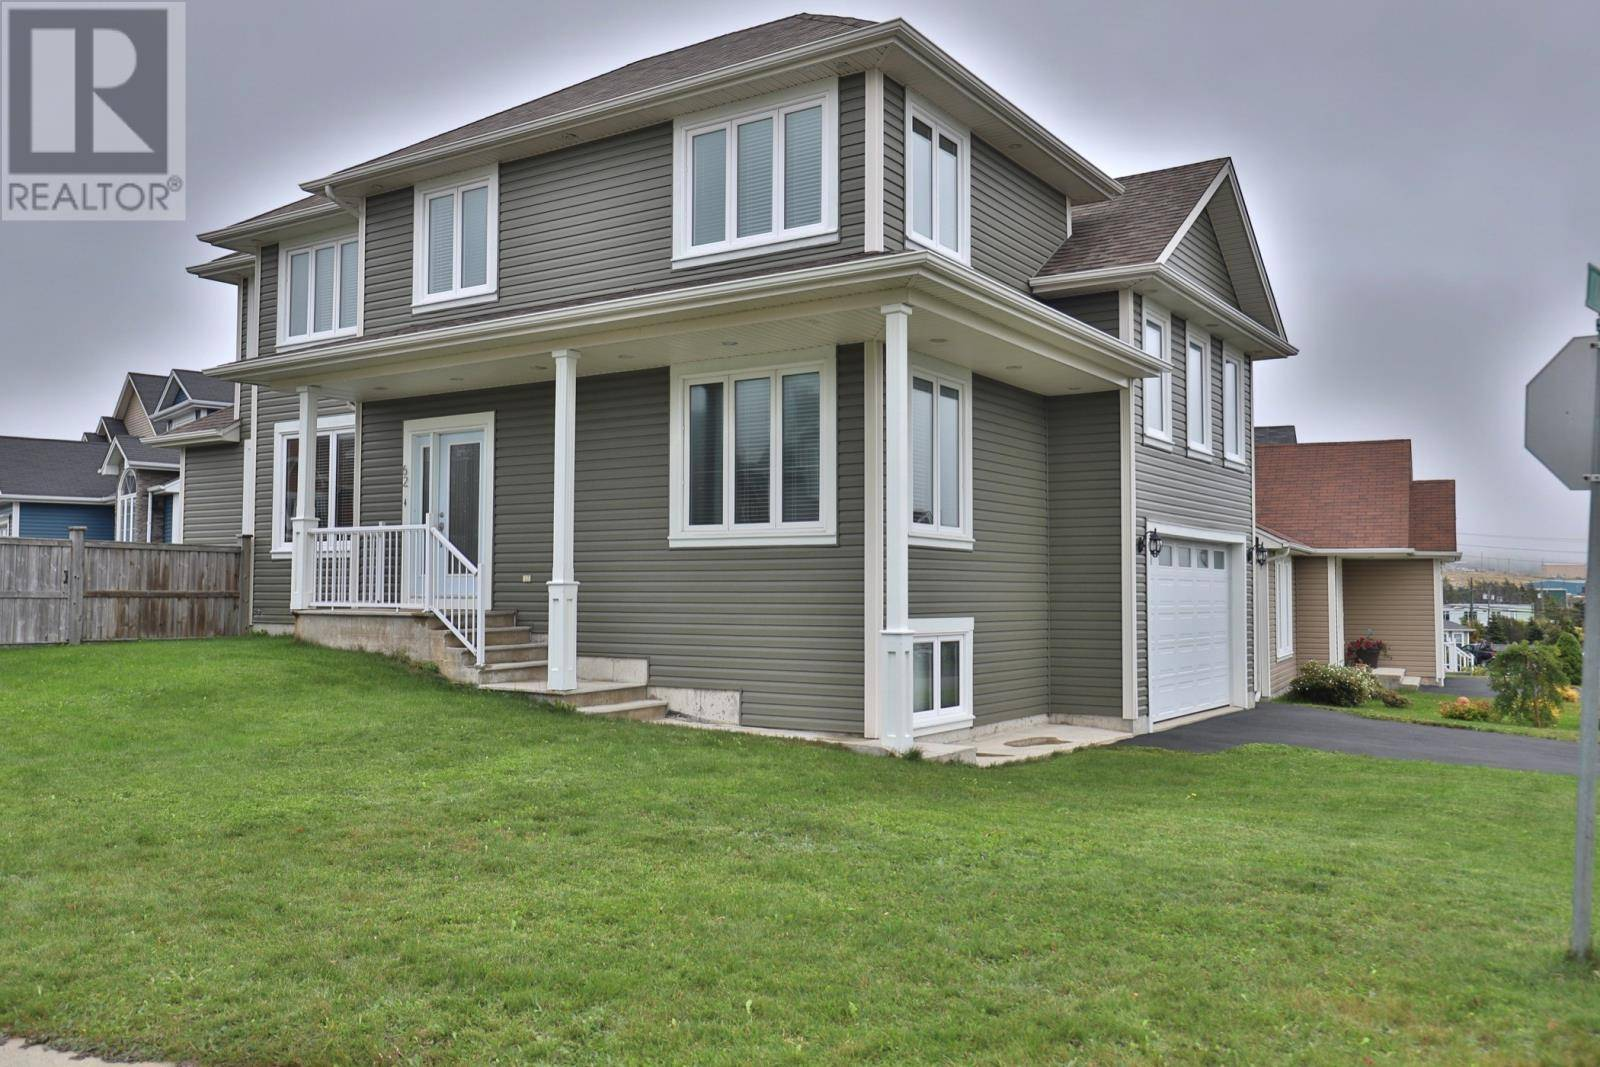 House for sale at 62 Julieann Pl St. John's Newfoundland - MLS: 1212549